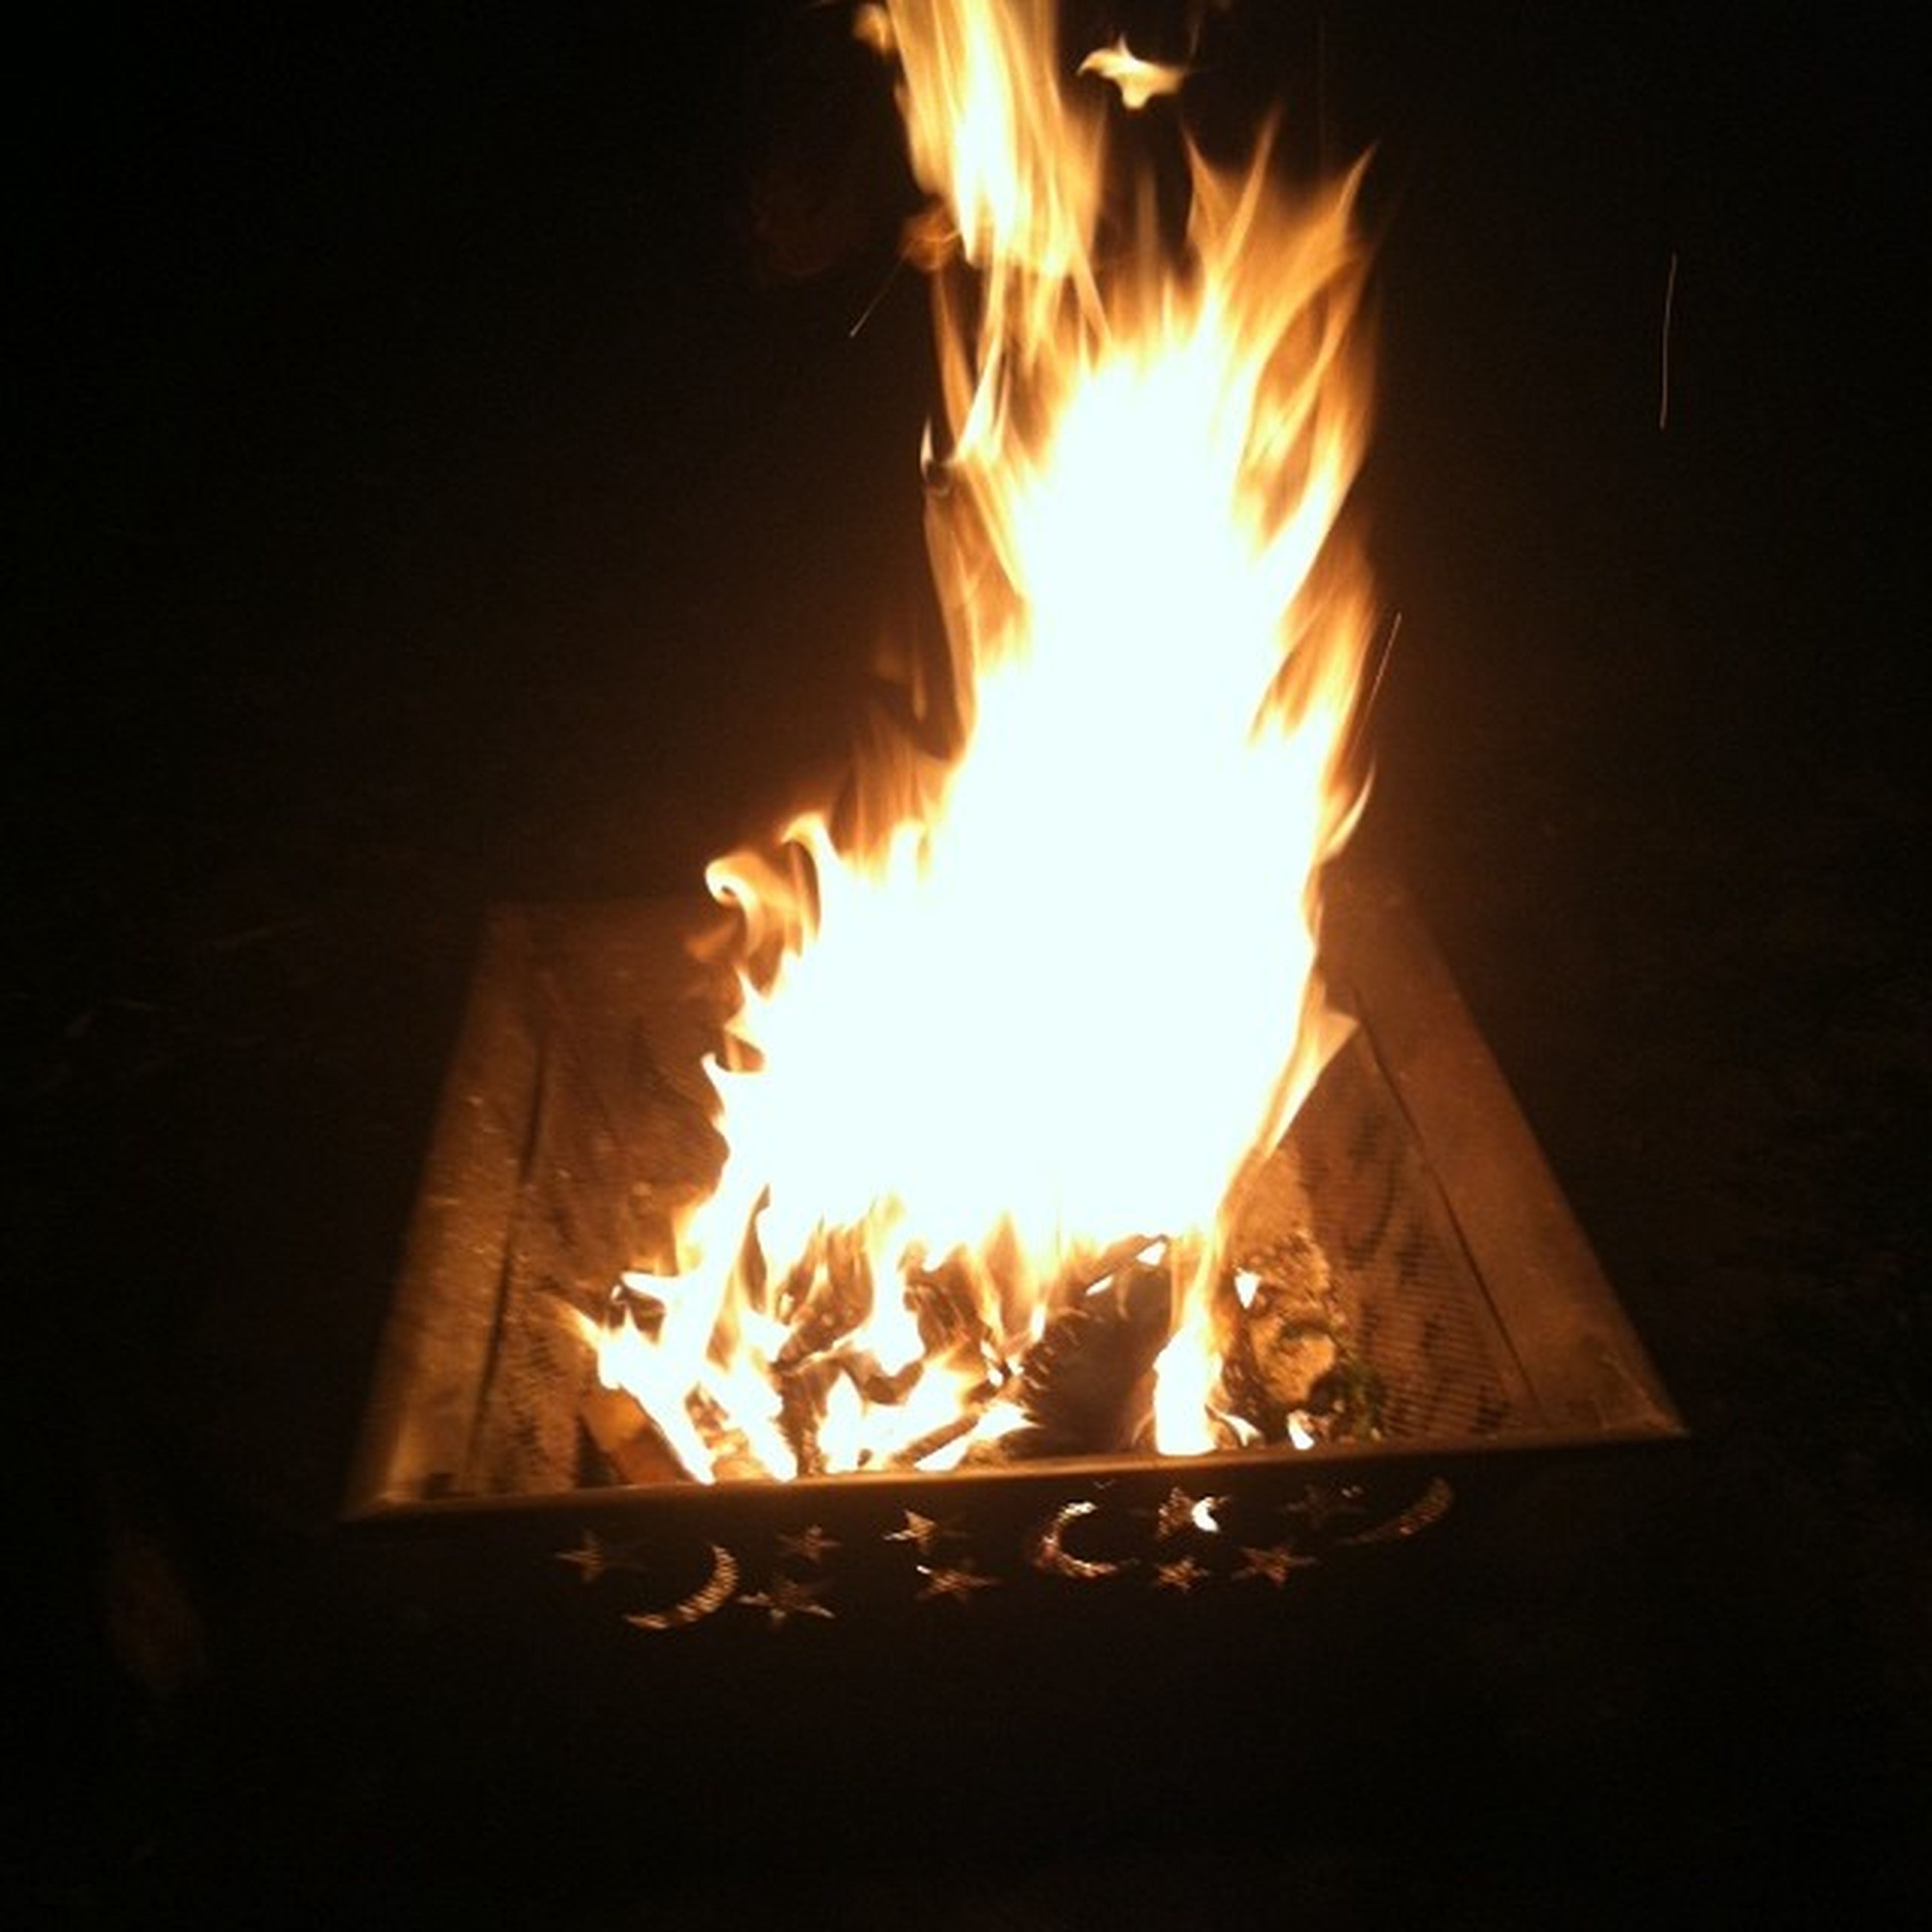 burning, flame, fire - natural phenomenon, heat - temperature, glowing, night, fire, bonfire, firewood, dark, heat, orange color, illuminated, copy space, campfire, wood - material, light - natural phenomenon, sunlight, close-up, no people